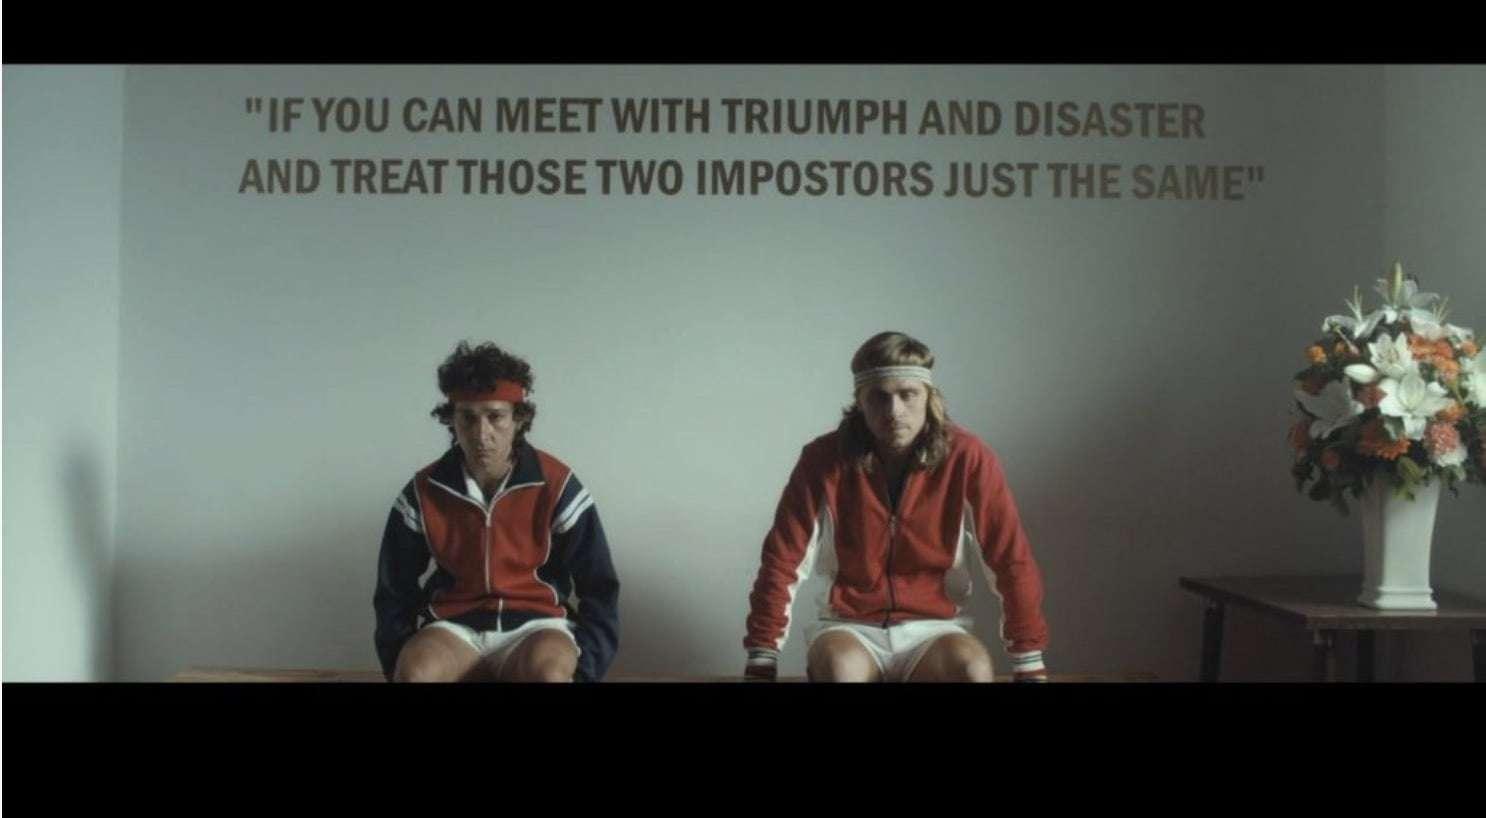 Wimbledon Kipling IF_Sweat Your Assets_Mc Enroe Borg